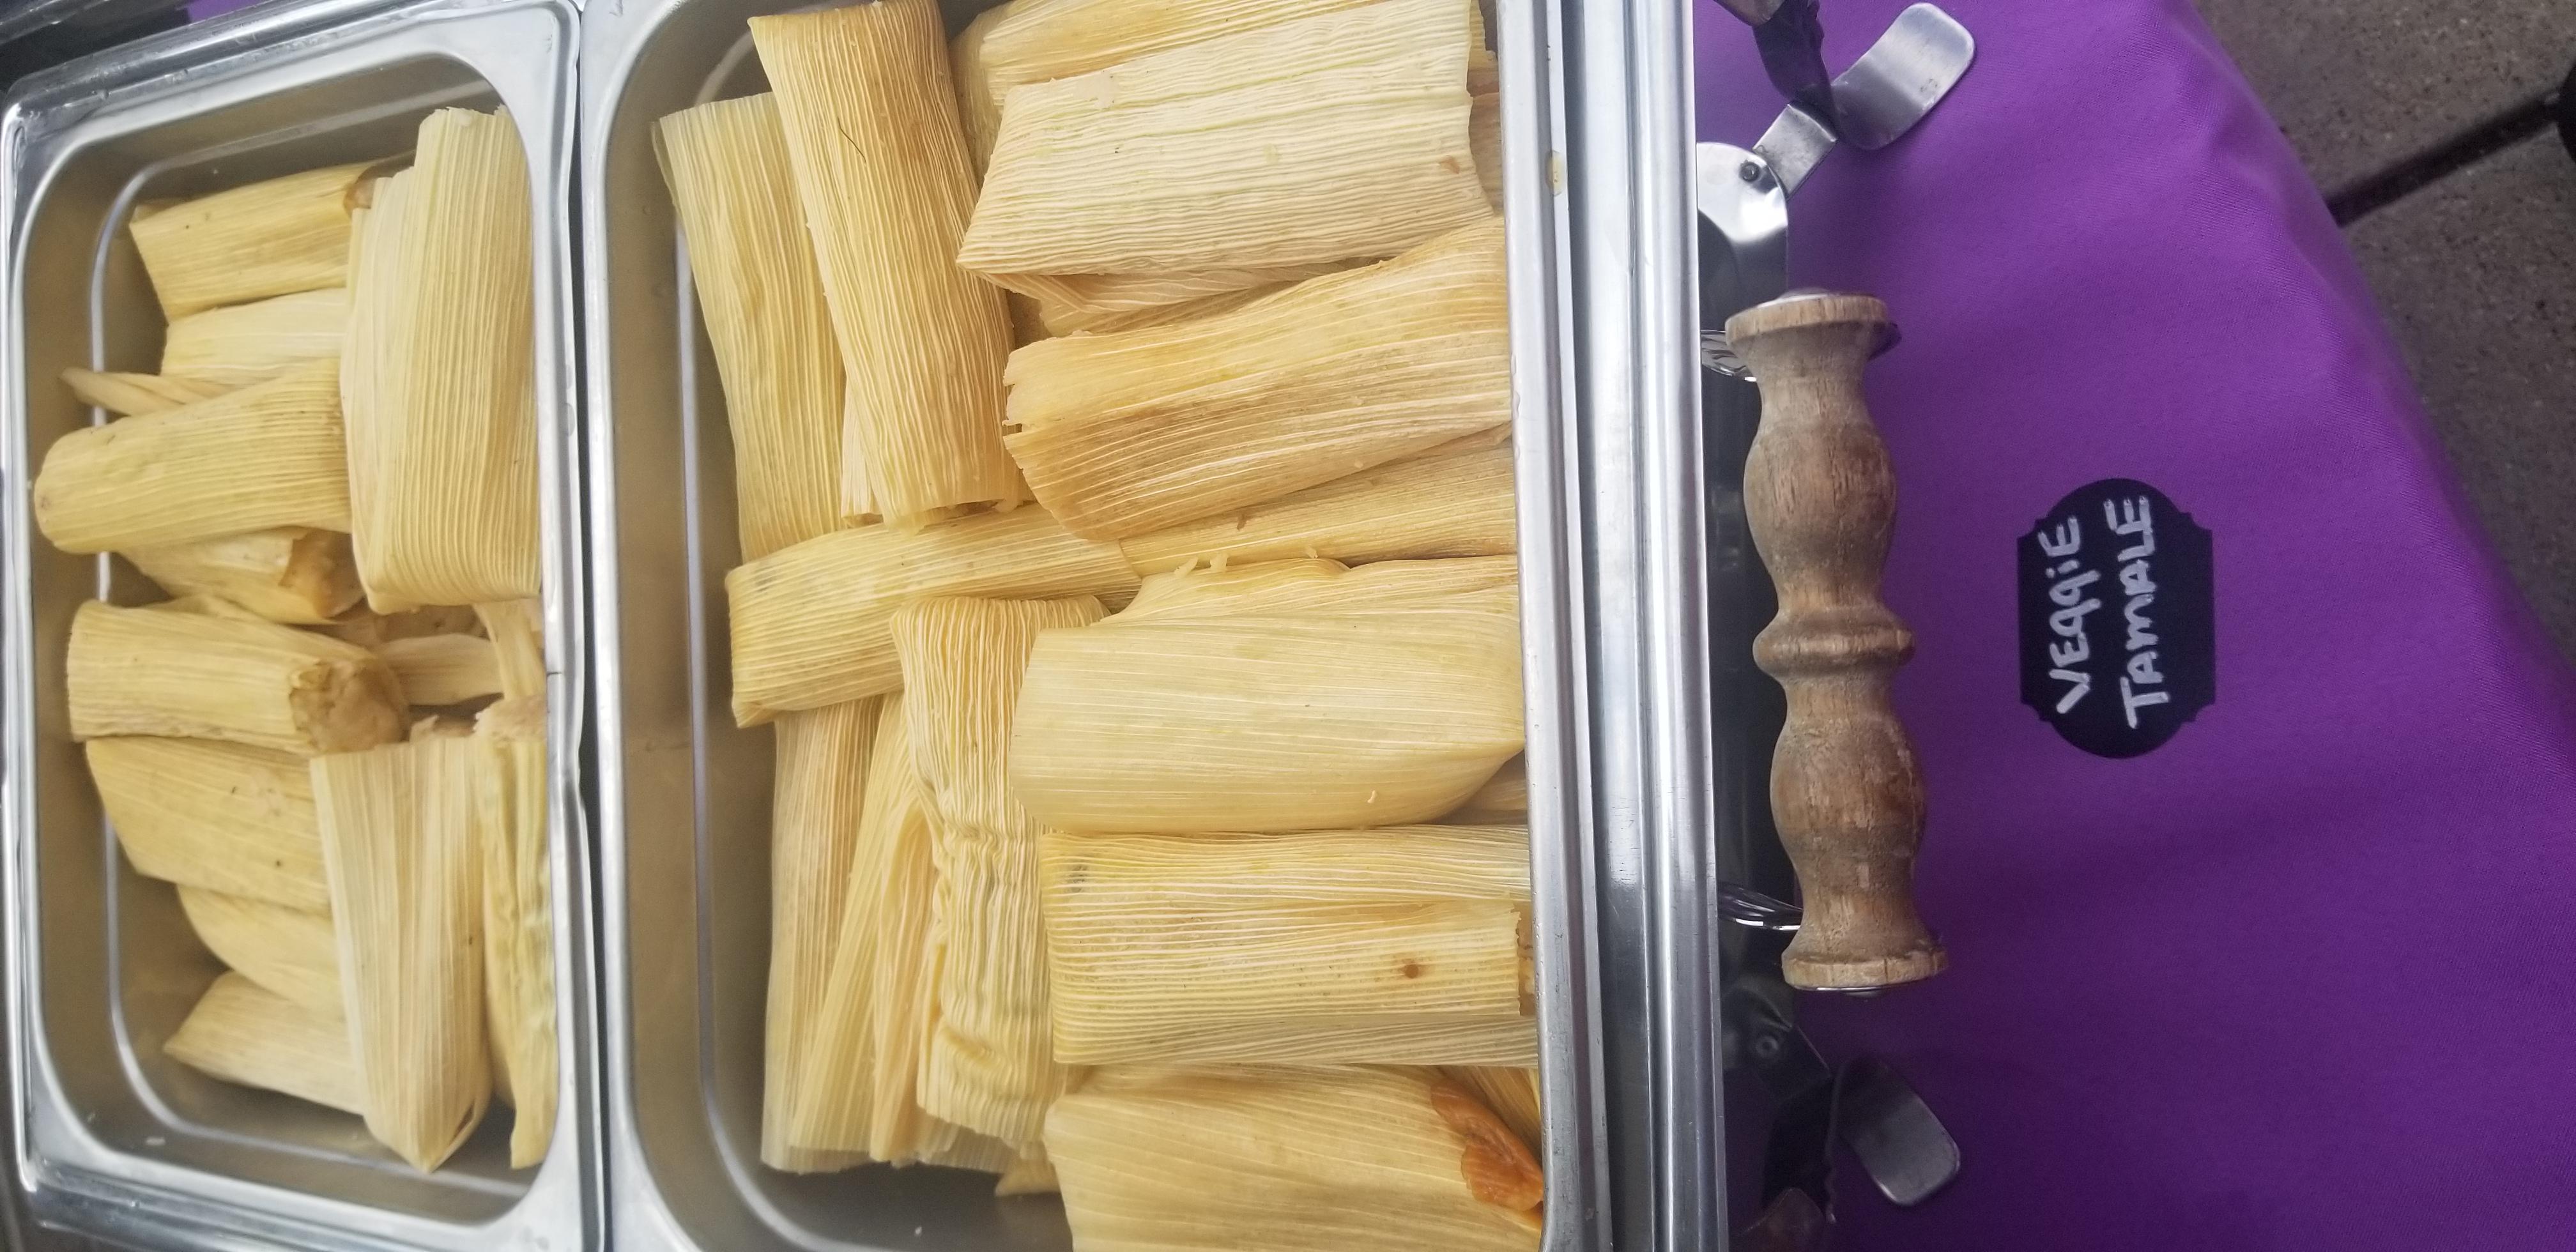 Vegatarian tamales